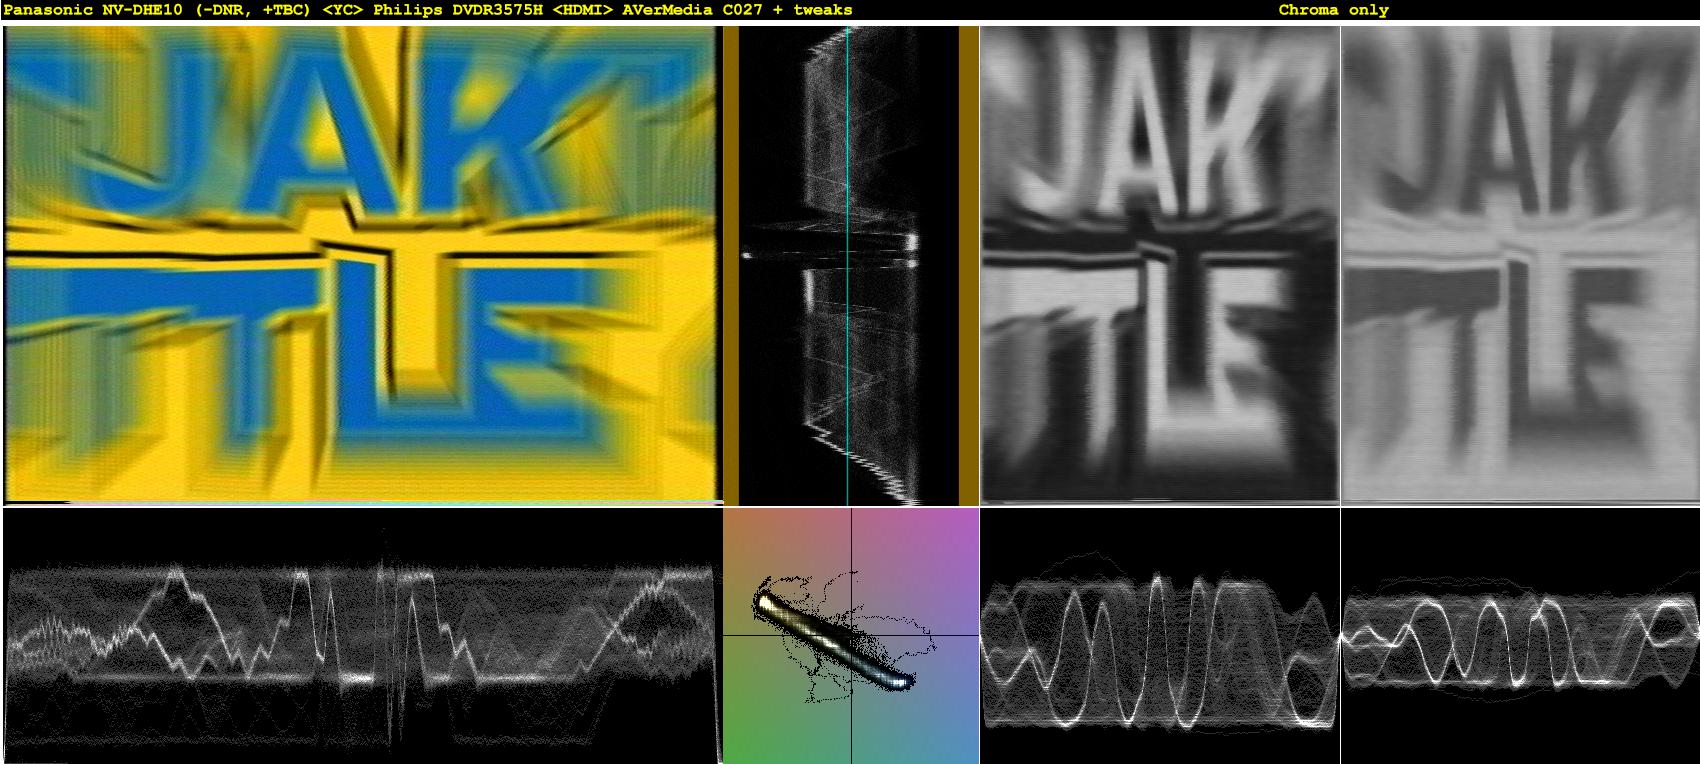 Click image for larger version  Name:0-05-05 - Panasonic NV-DHE10 (-DNR, +TBC).png Views:1004 Size:1.15 MB ID:38007